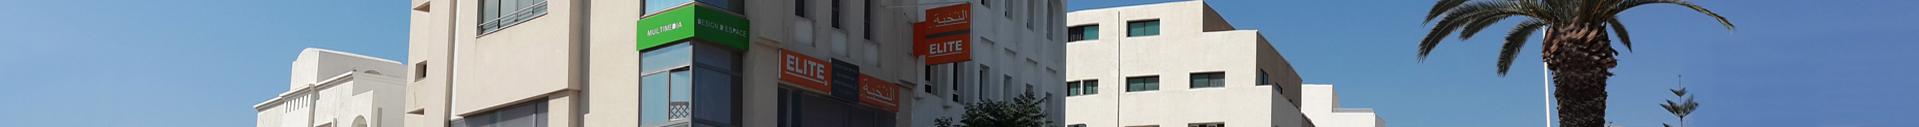 ELite-diplomes-BTP-BTS